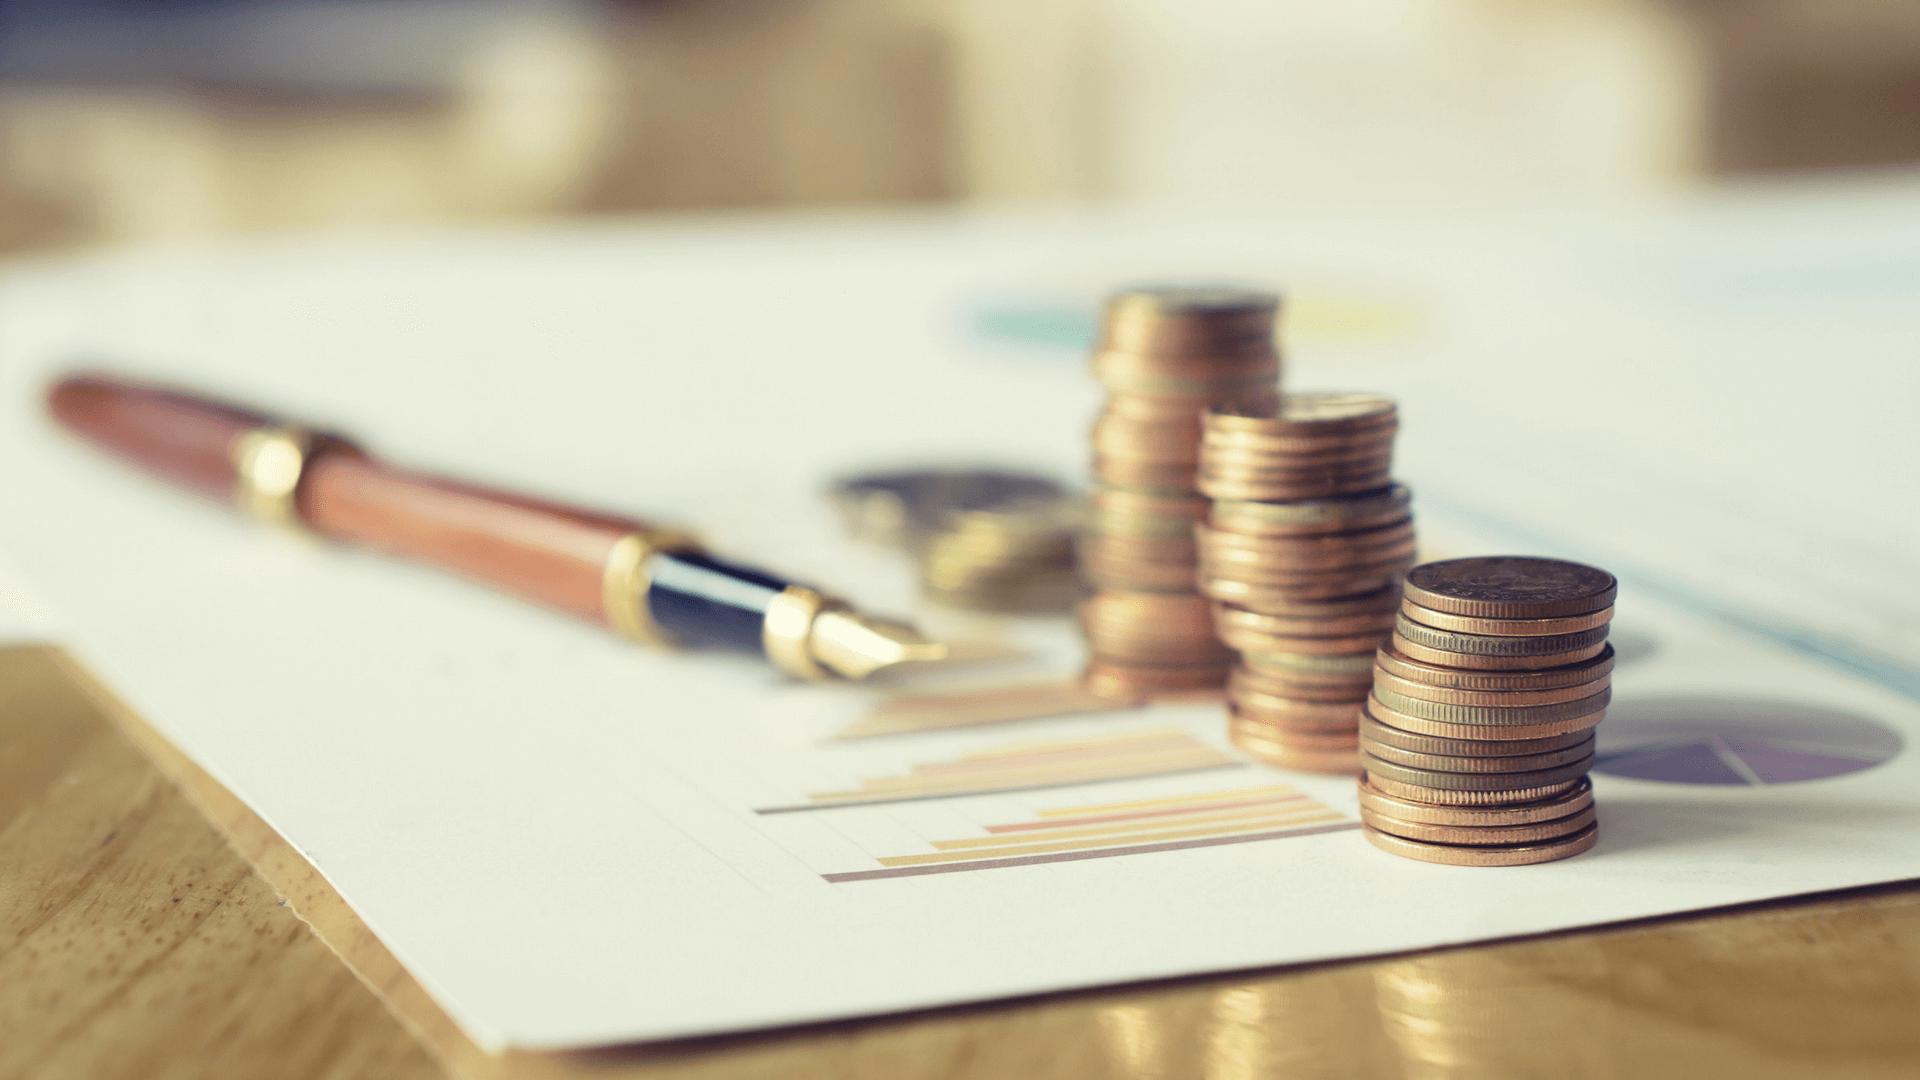 [2019 Updates] Three Factors Impacting Government CIO Budgets